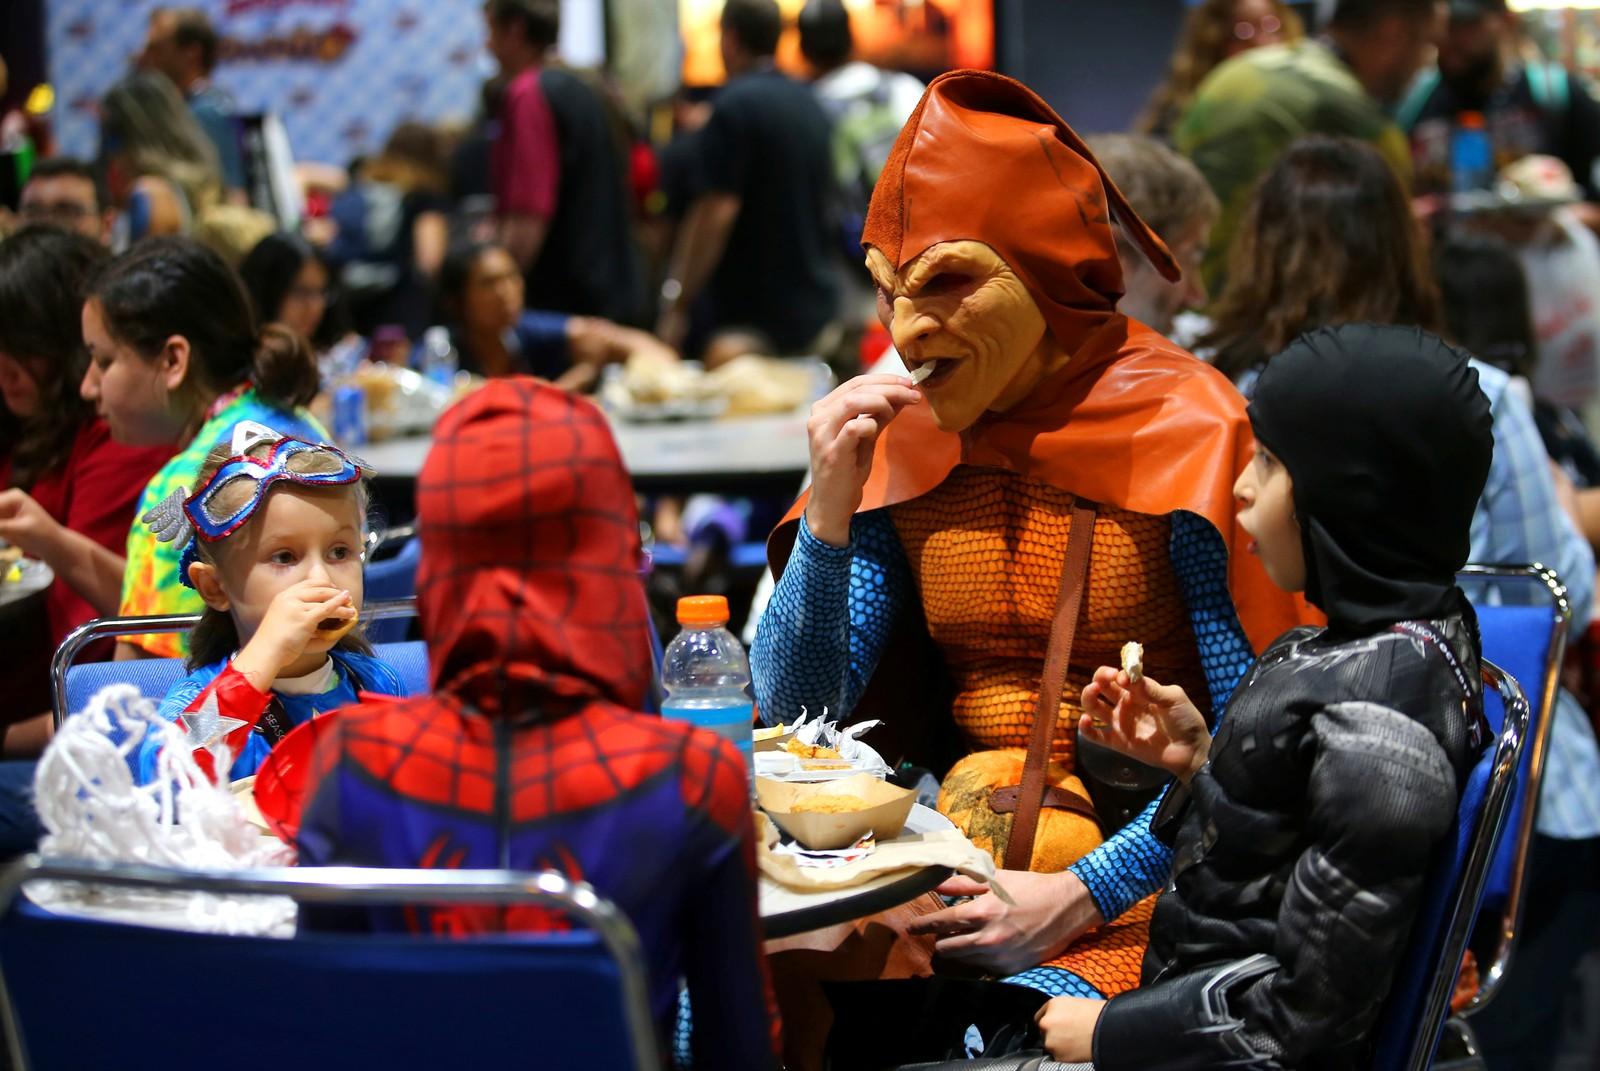 Andre Rhoden, utkledd som Hobgoblin, har tatt med seg barna til lunsj under Comic Con i San Diego i California.